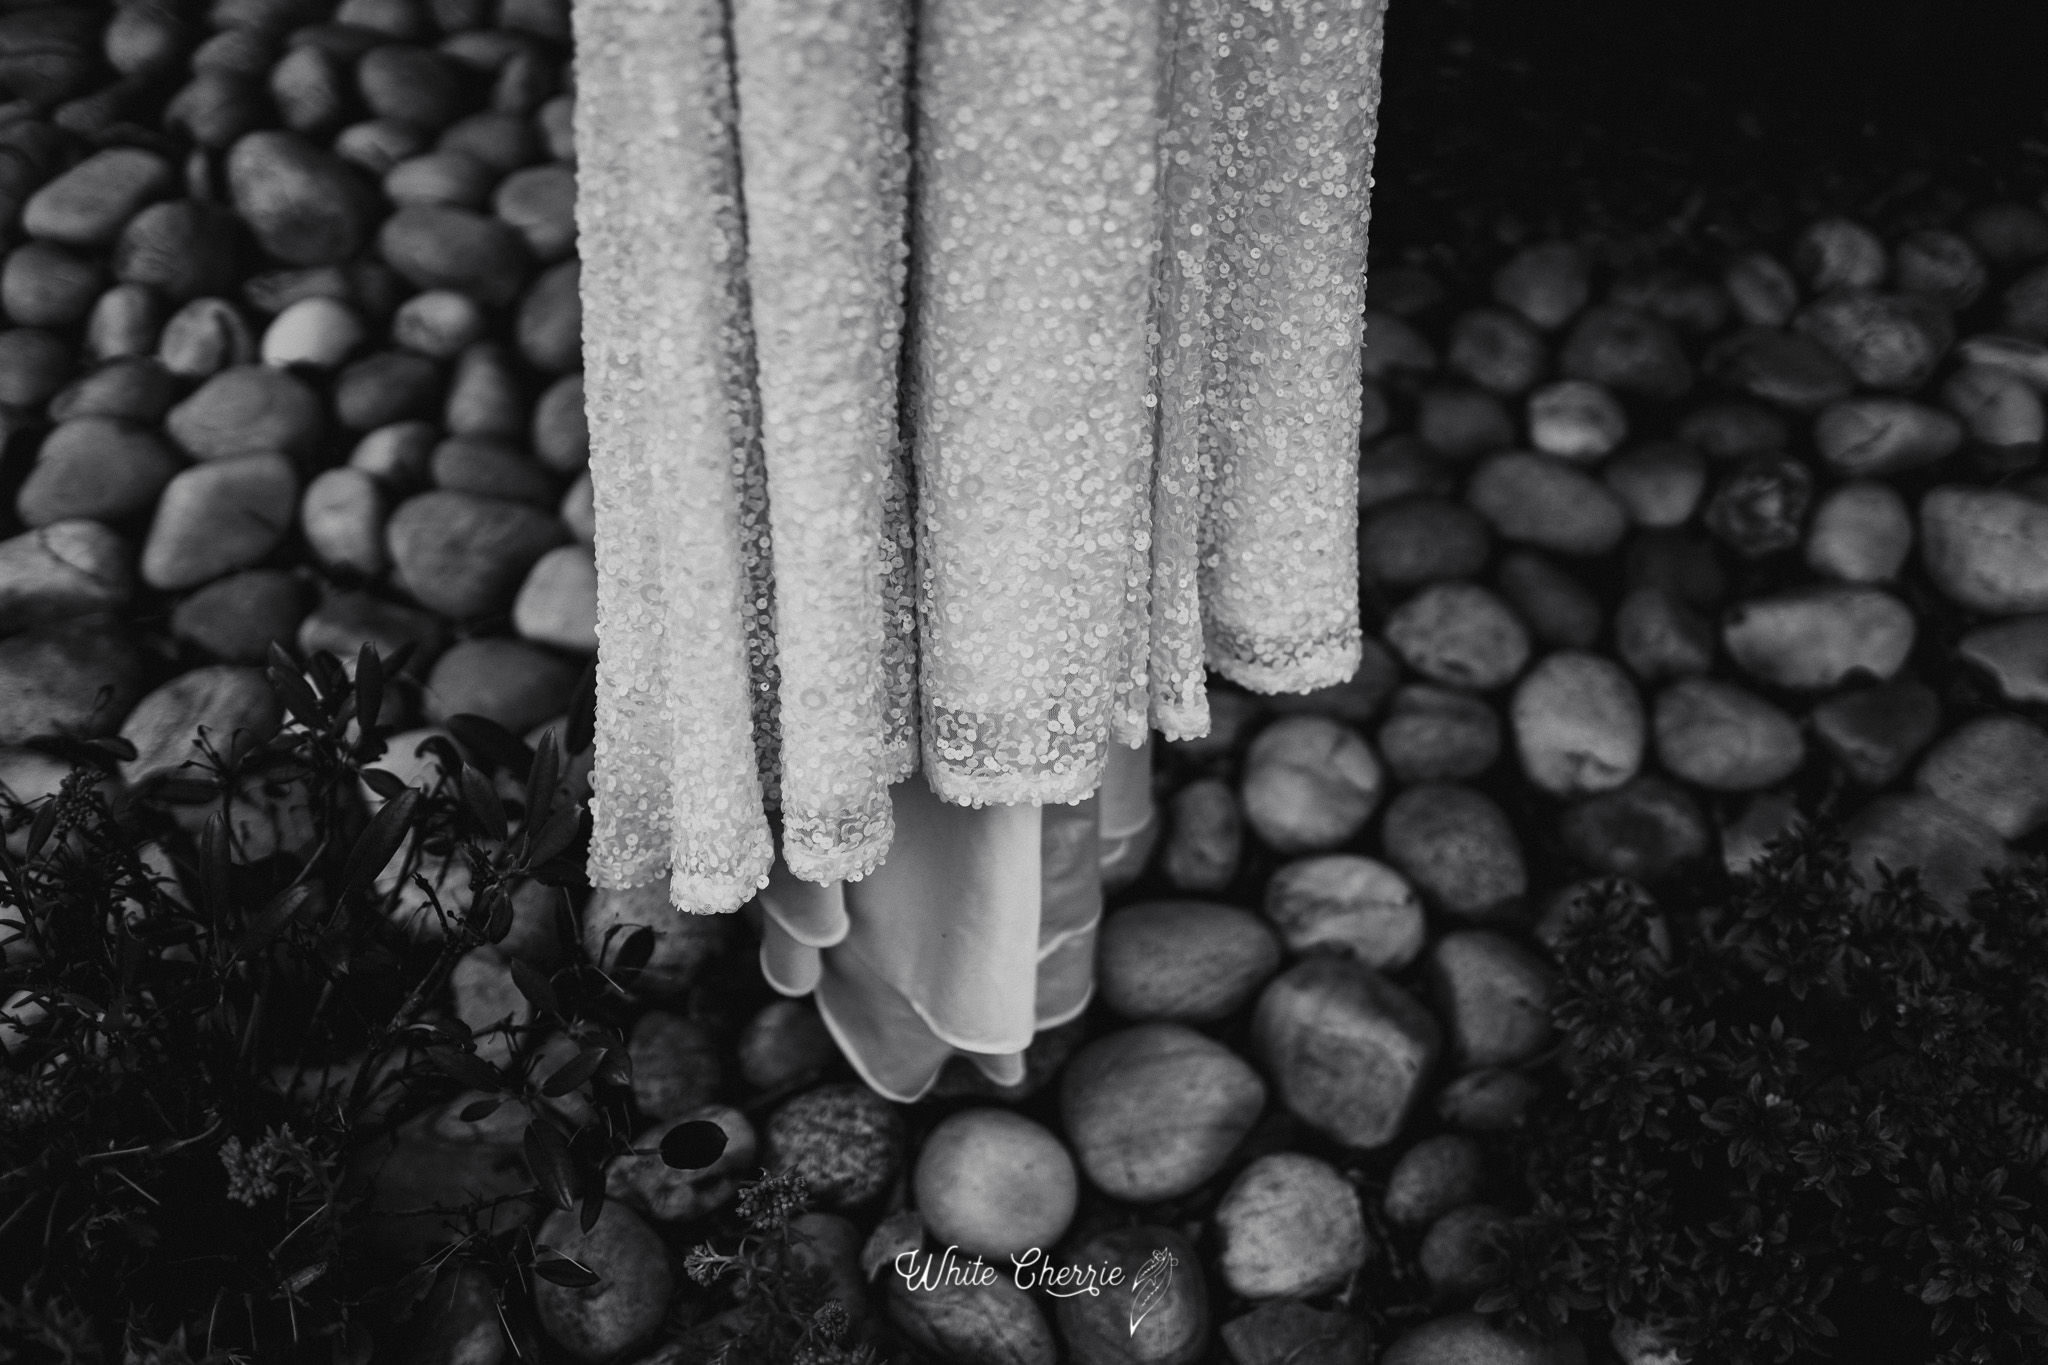 White_Cherrie-Caroline_Philip_prev-9.jpg